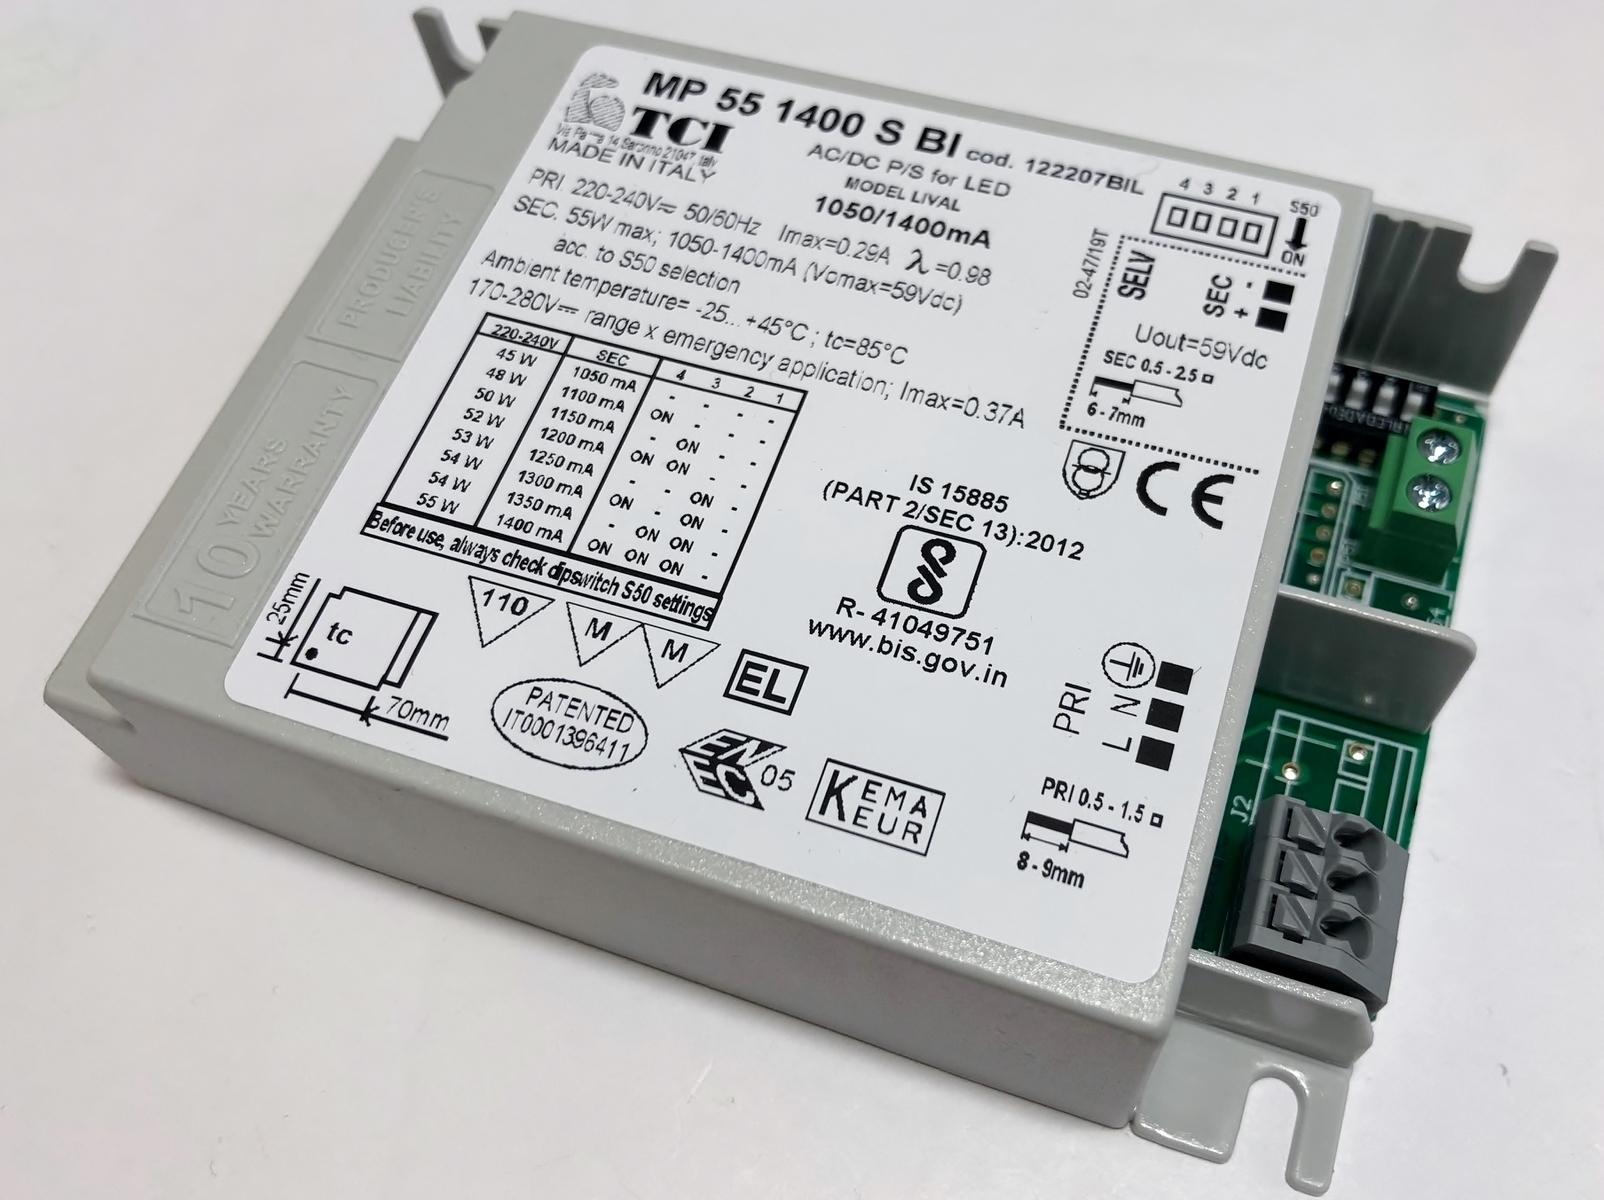 Elektrooniline  LED  trafo 45-55W, 1050-1400mA, max. 59V, Lival, MP 55 1400 S BI, 122207BIL